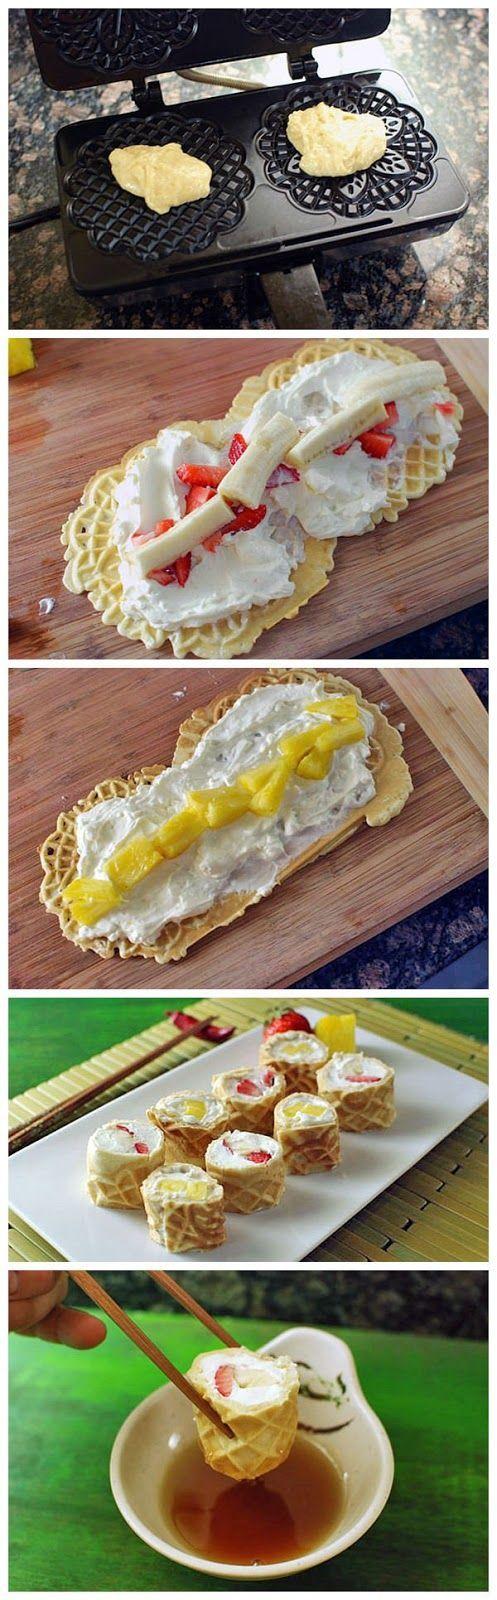 'Waffle' Breakfast 'Sushi' by tablespoon via normalrecipe